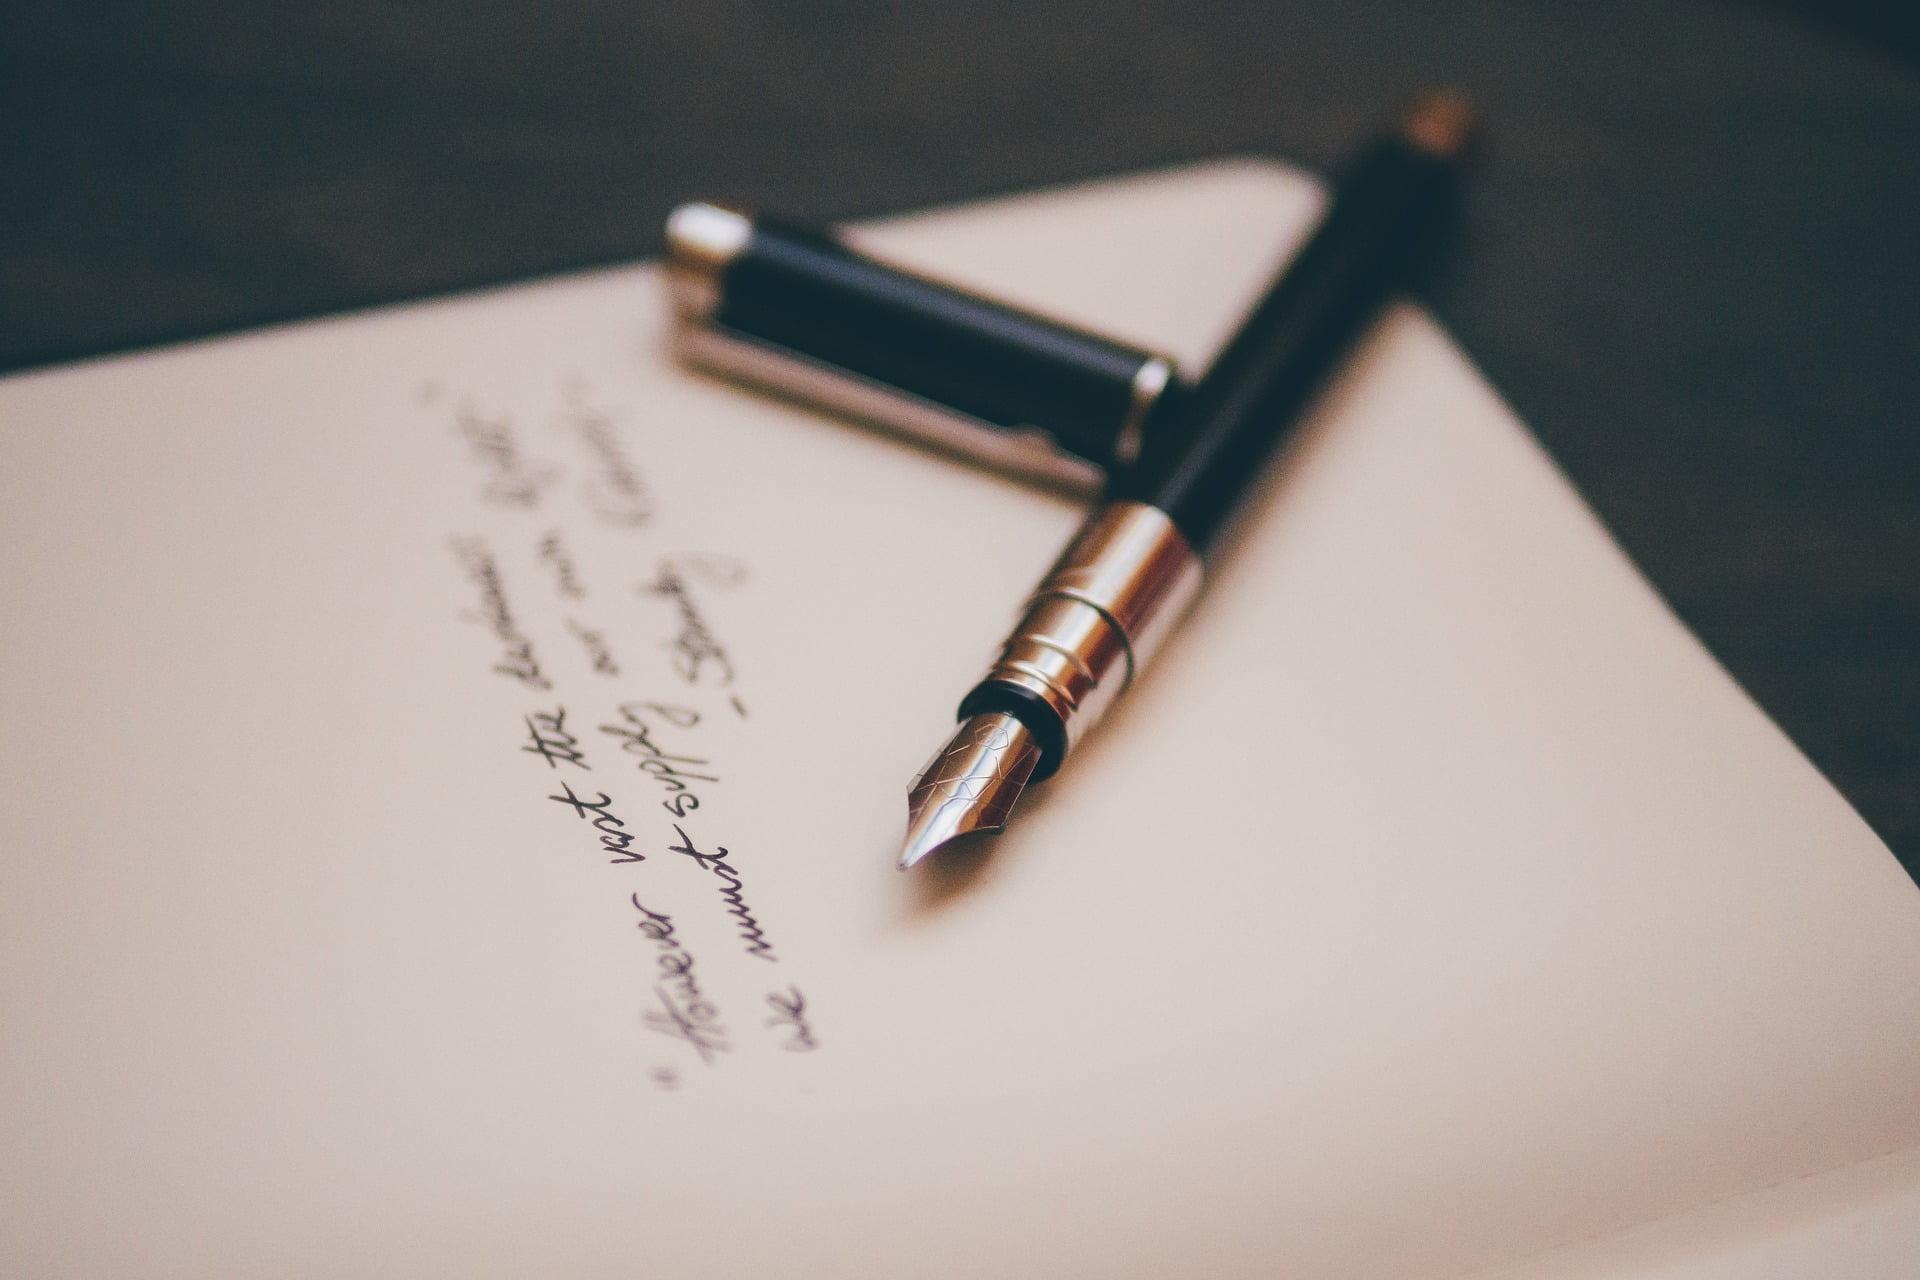 Best Budget Fountain Pen For Beginners